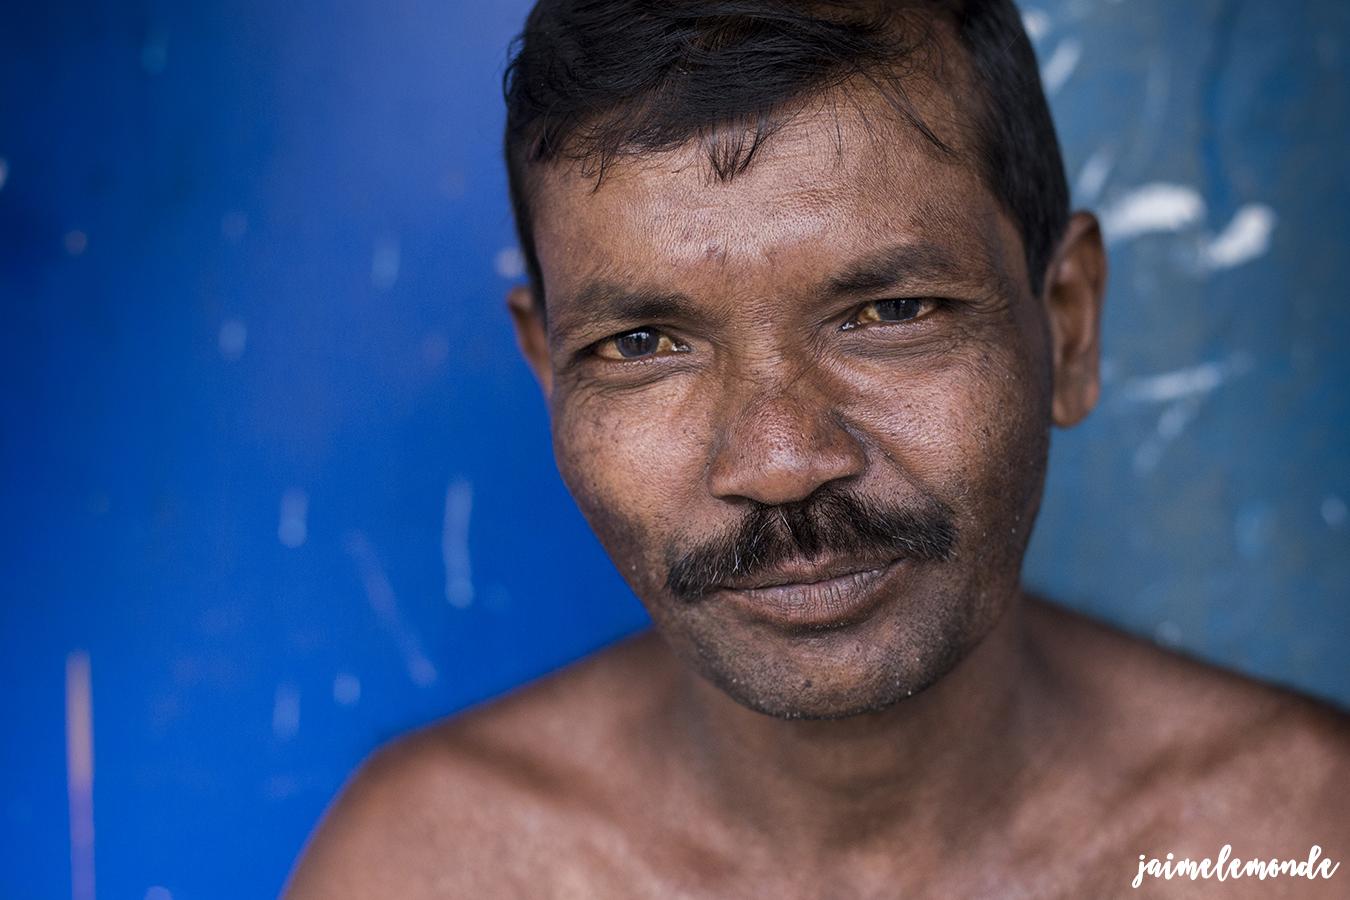 Portraits de voyage au Sri Lanka ©jaimelemonde (11)